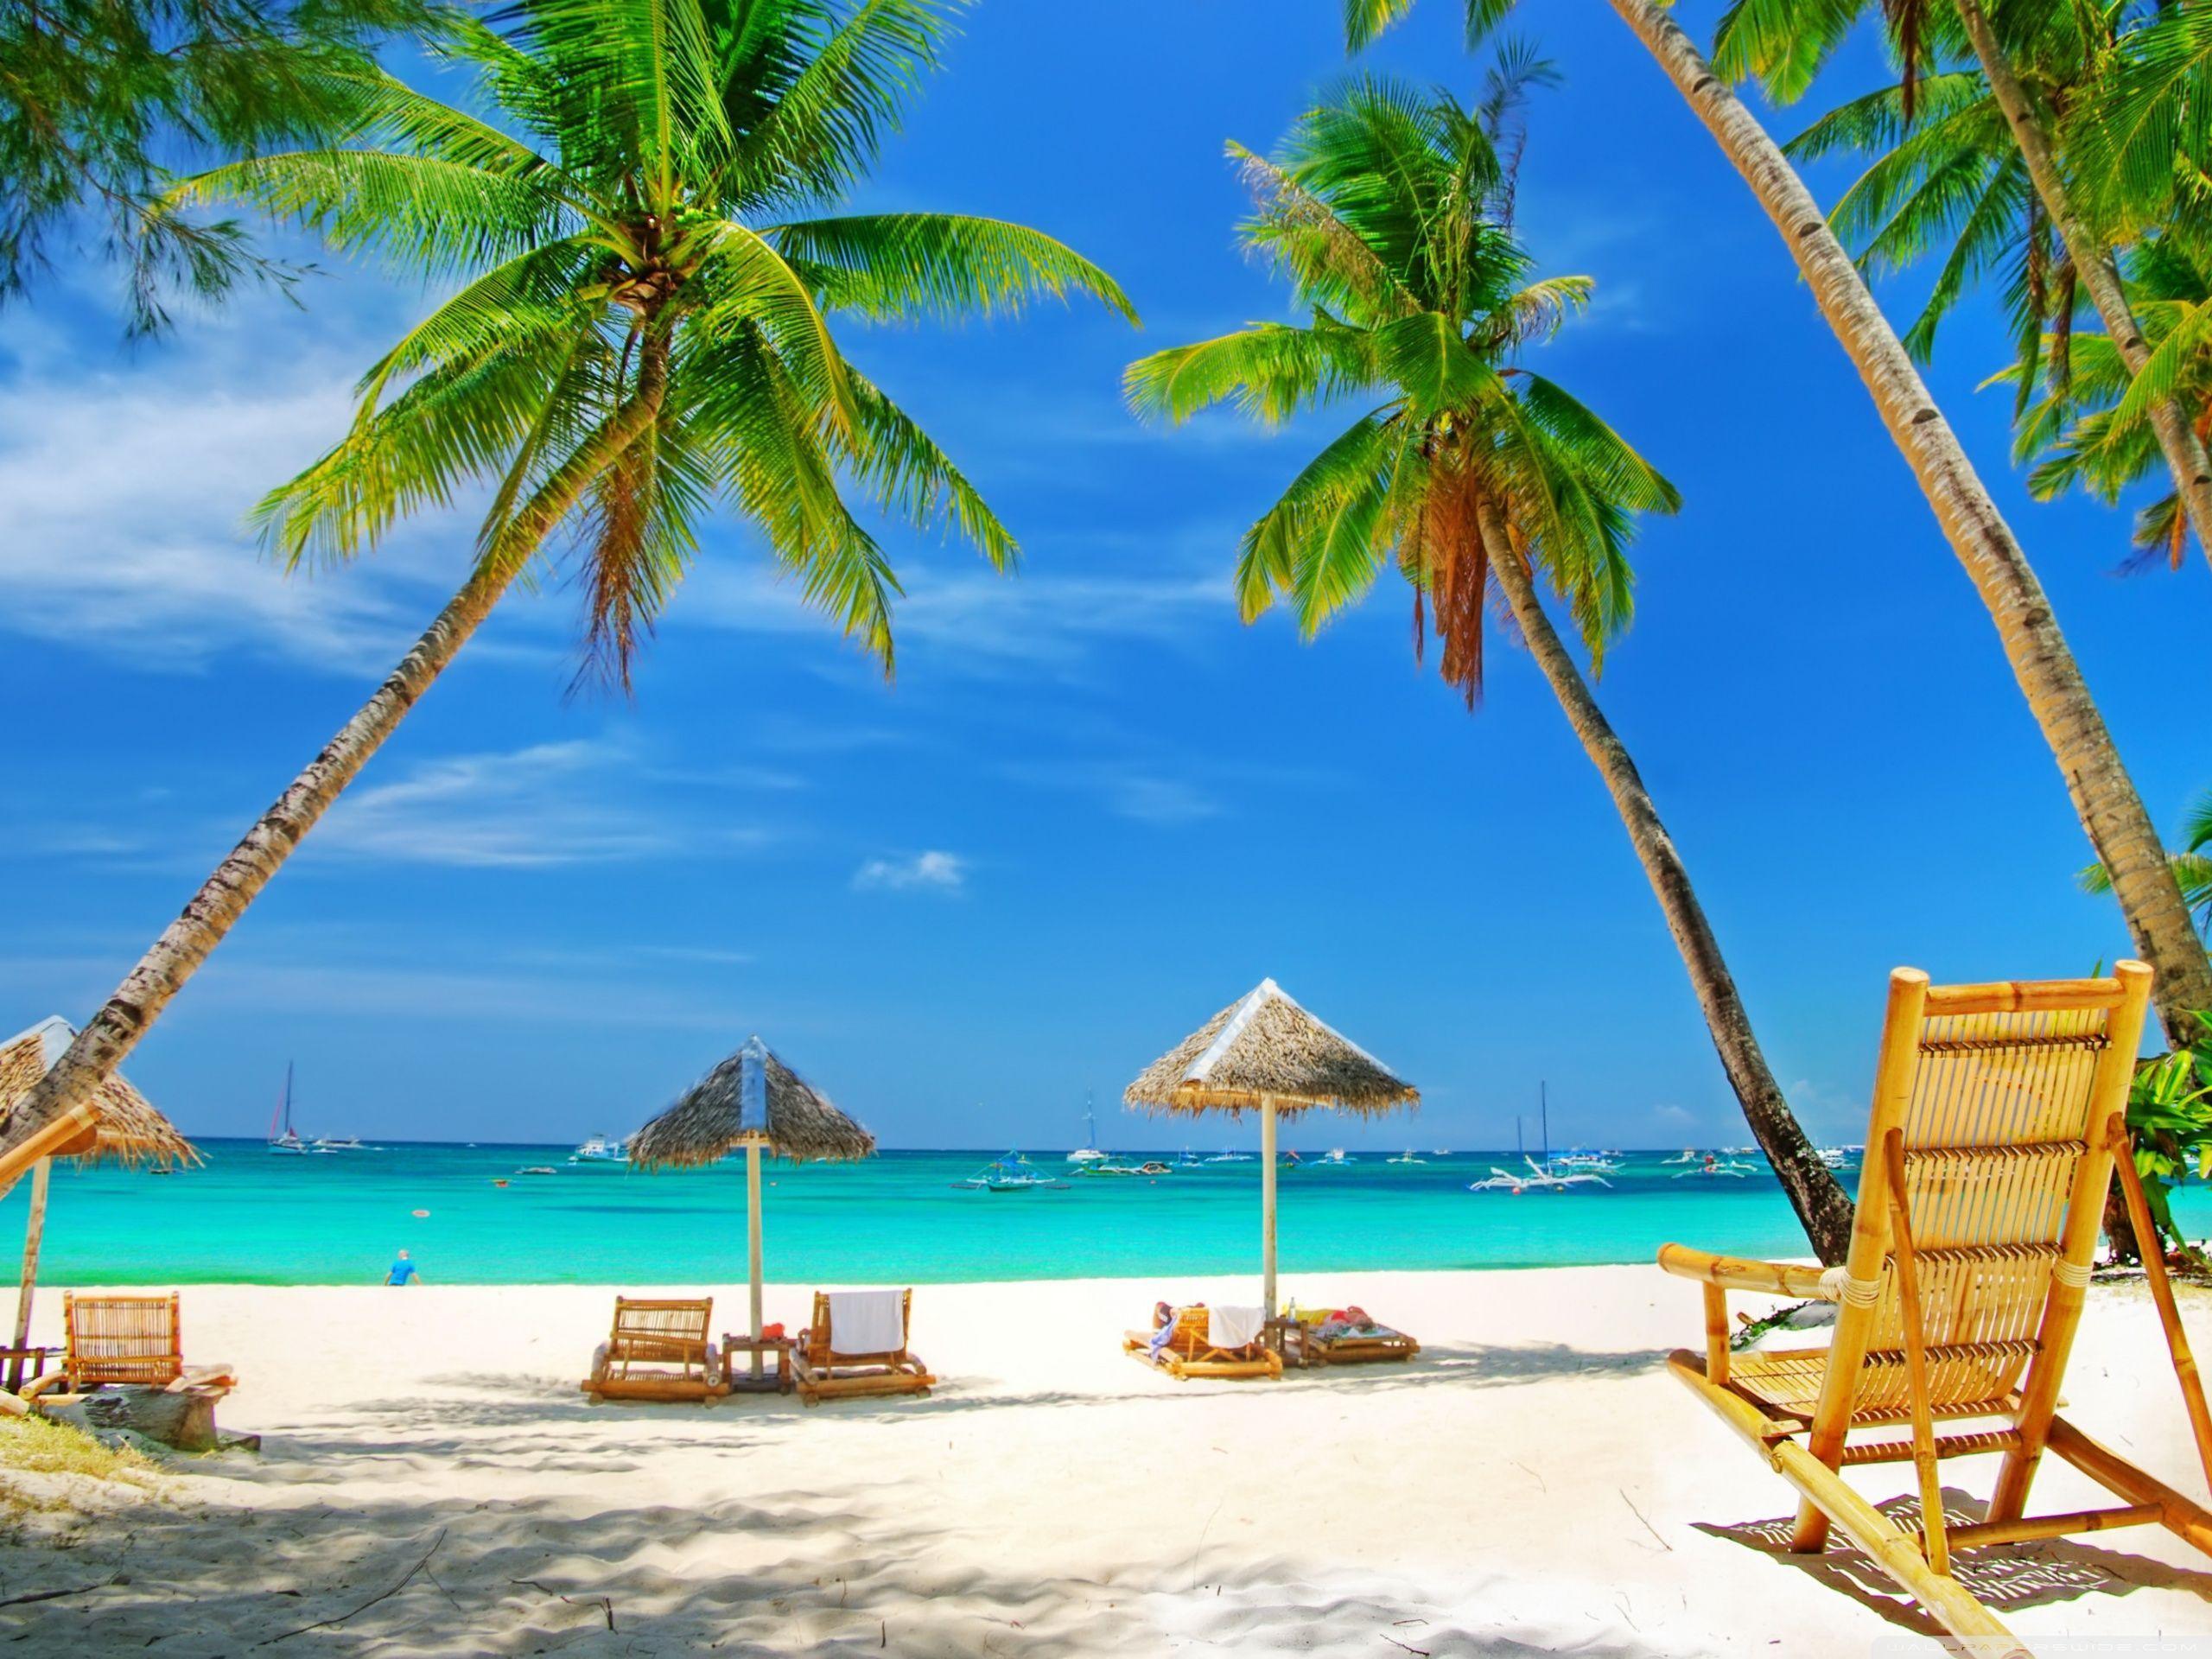 Paradise Beach Wallpapers Top Free Paradise Beach